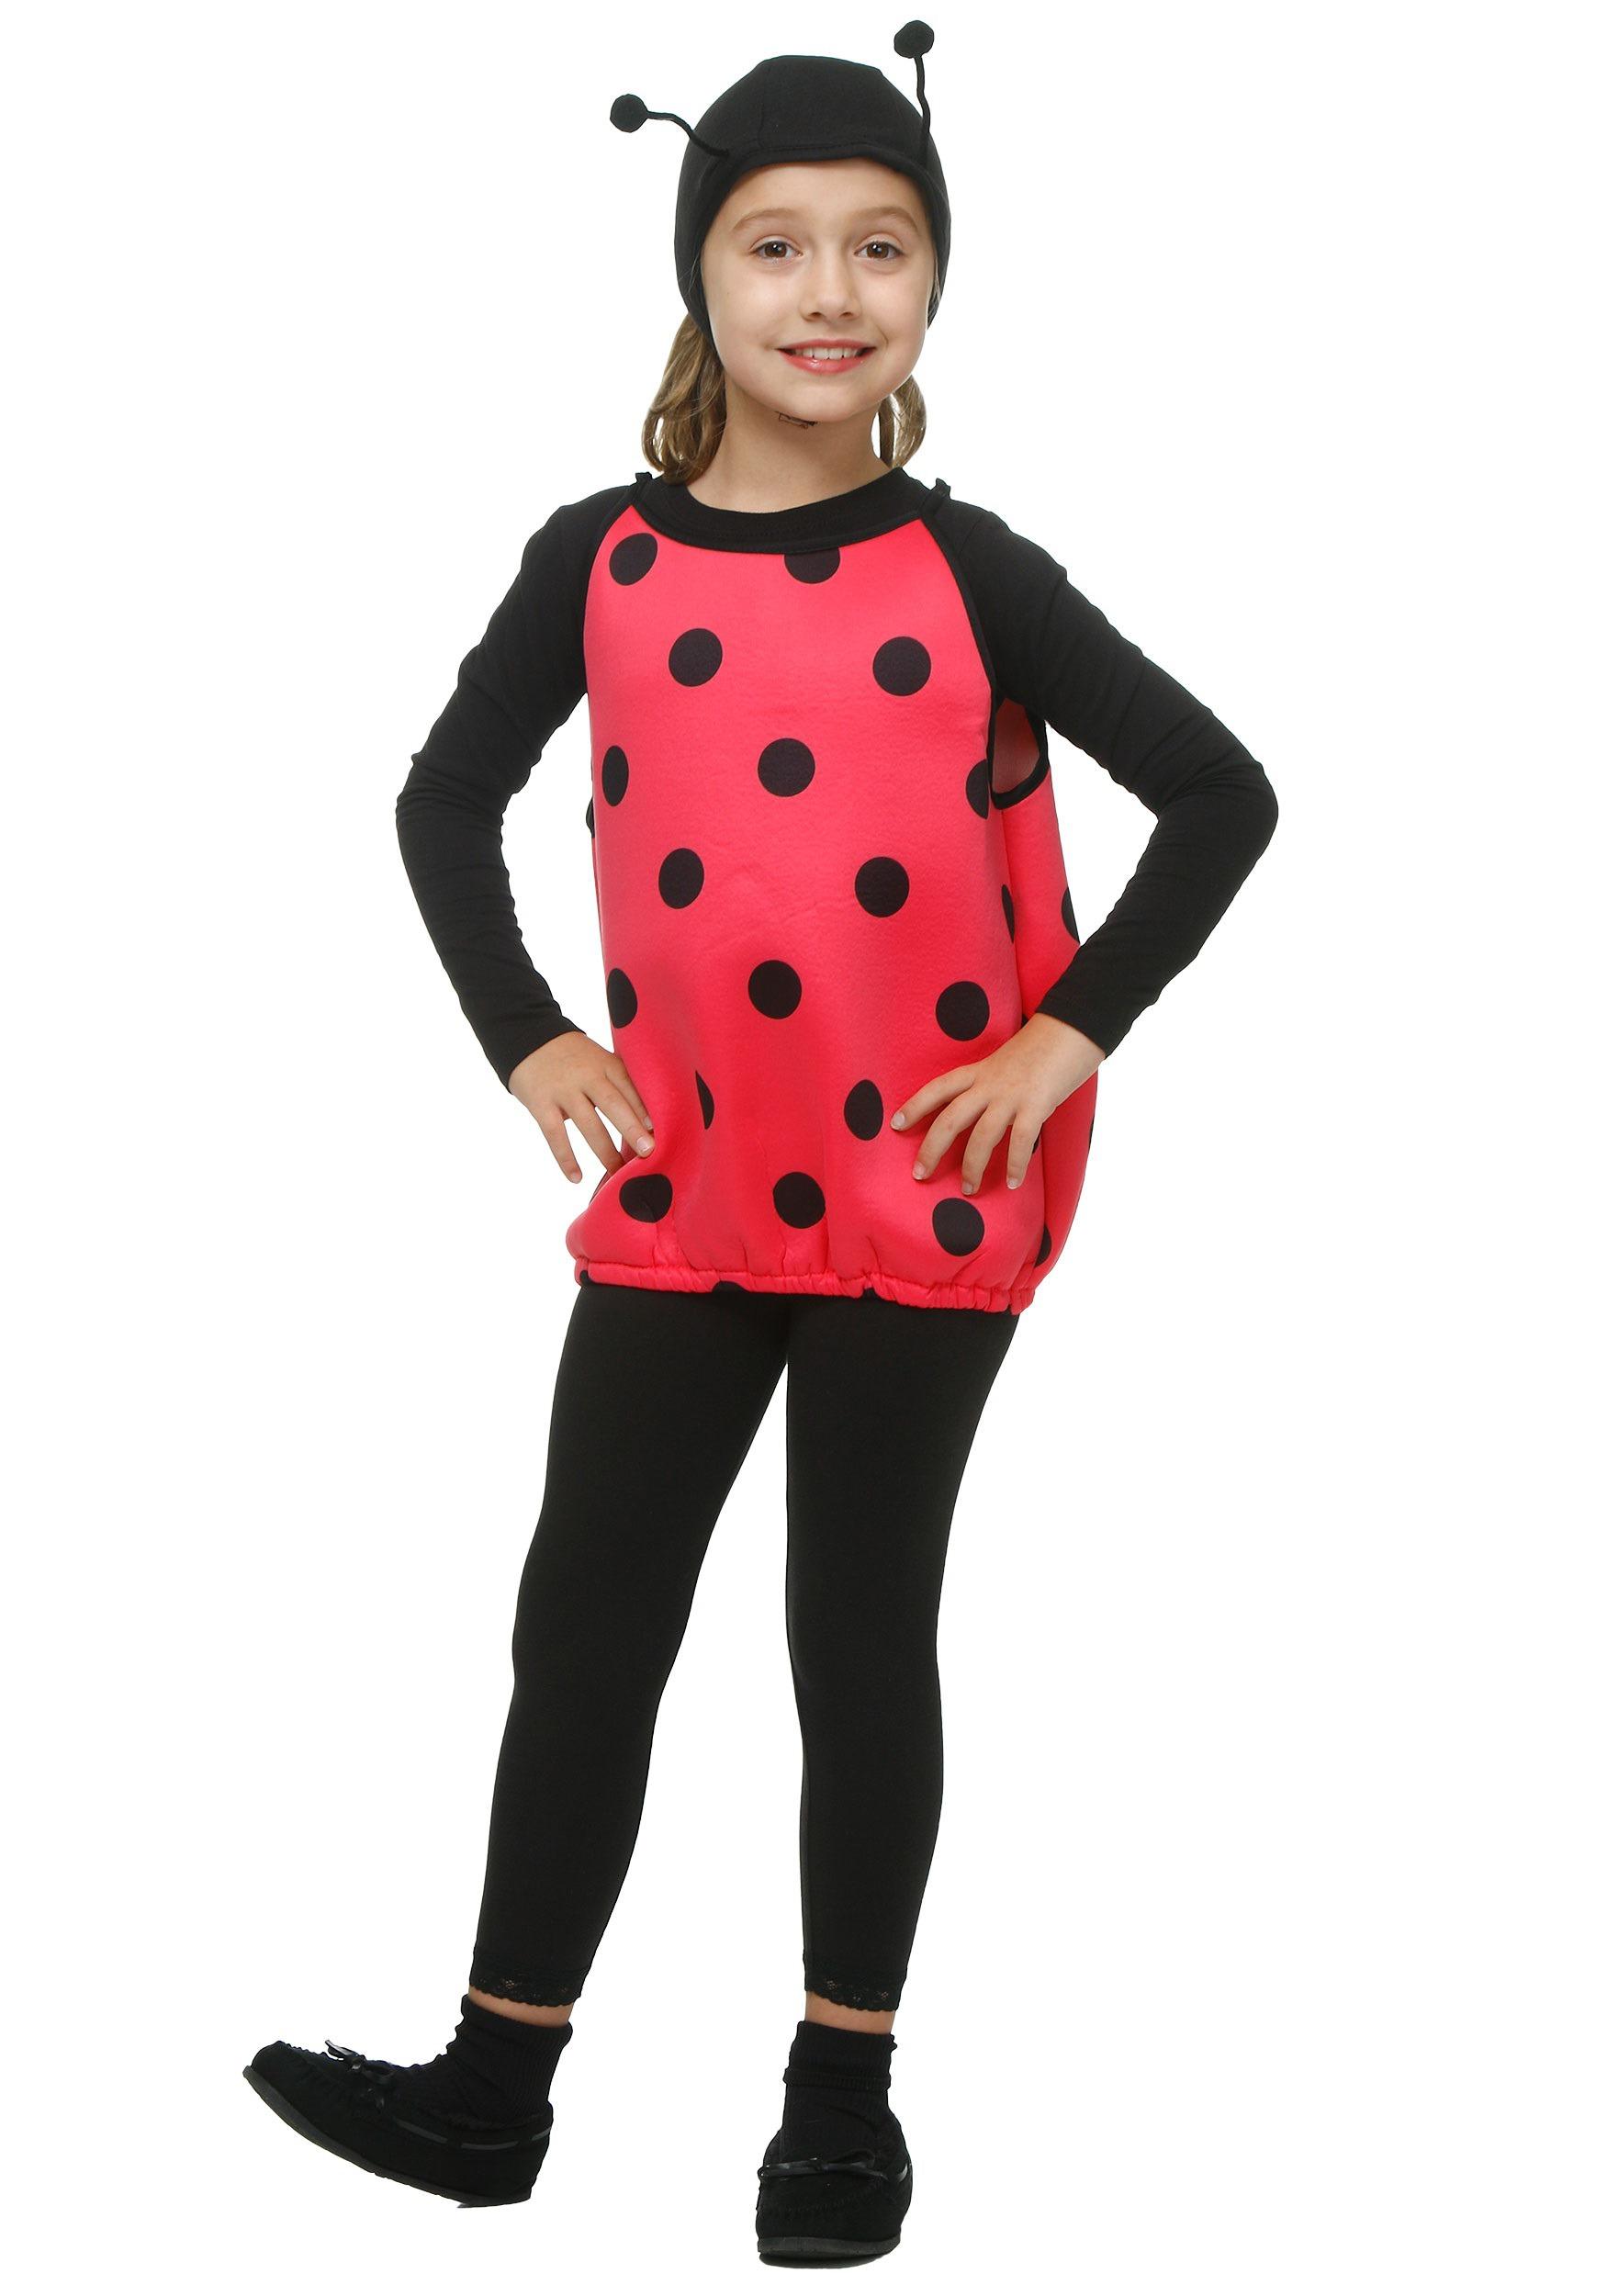 Girls Ladybug Costume FO54133